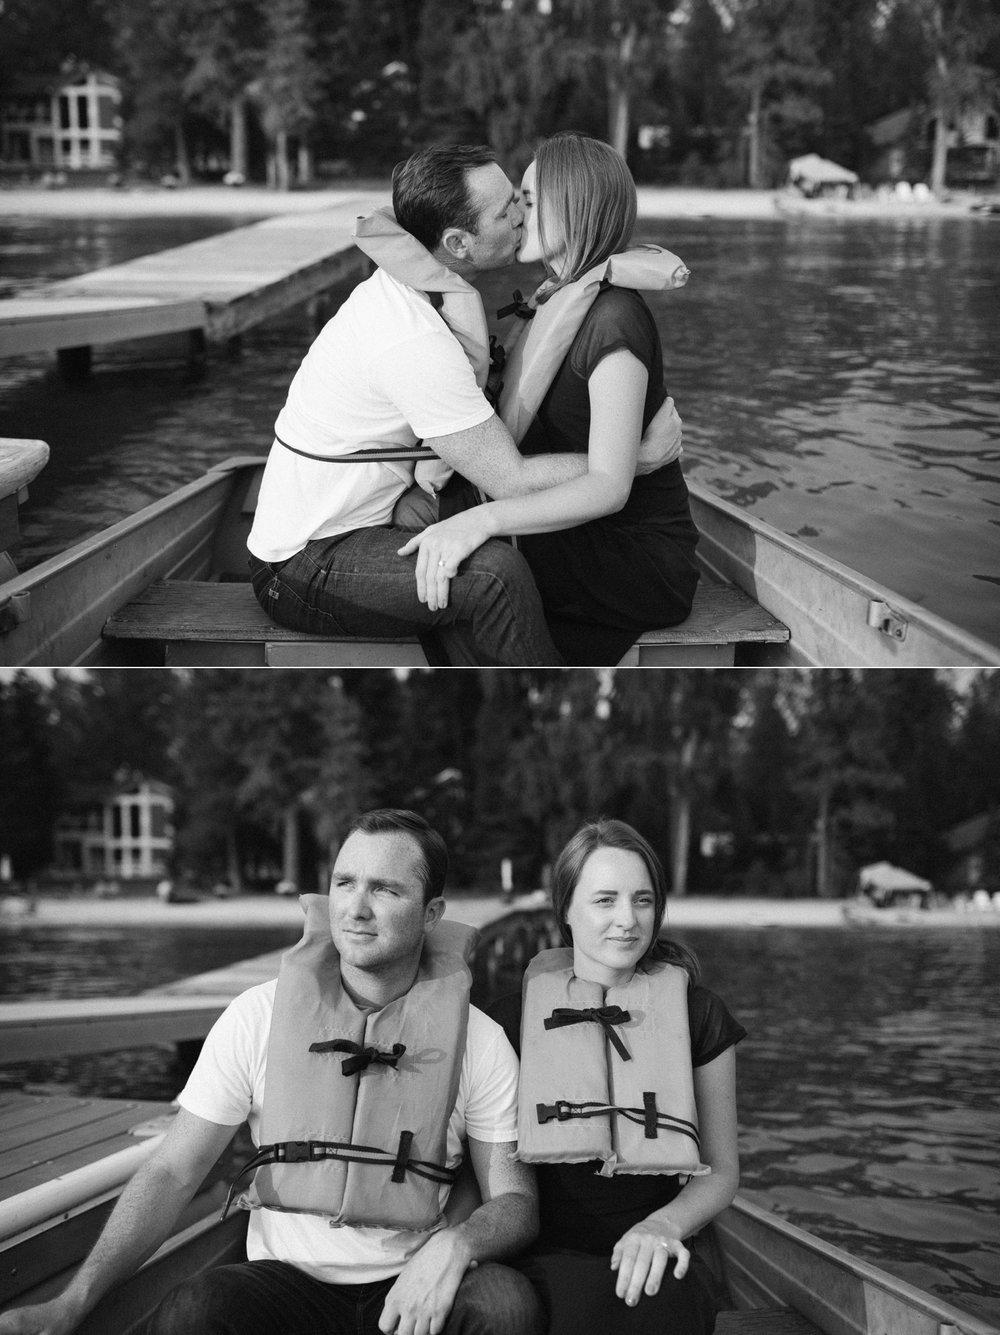 Priest-Lake-Idaho-Engagement-Portrait-Photo-04.JPG